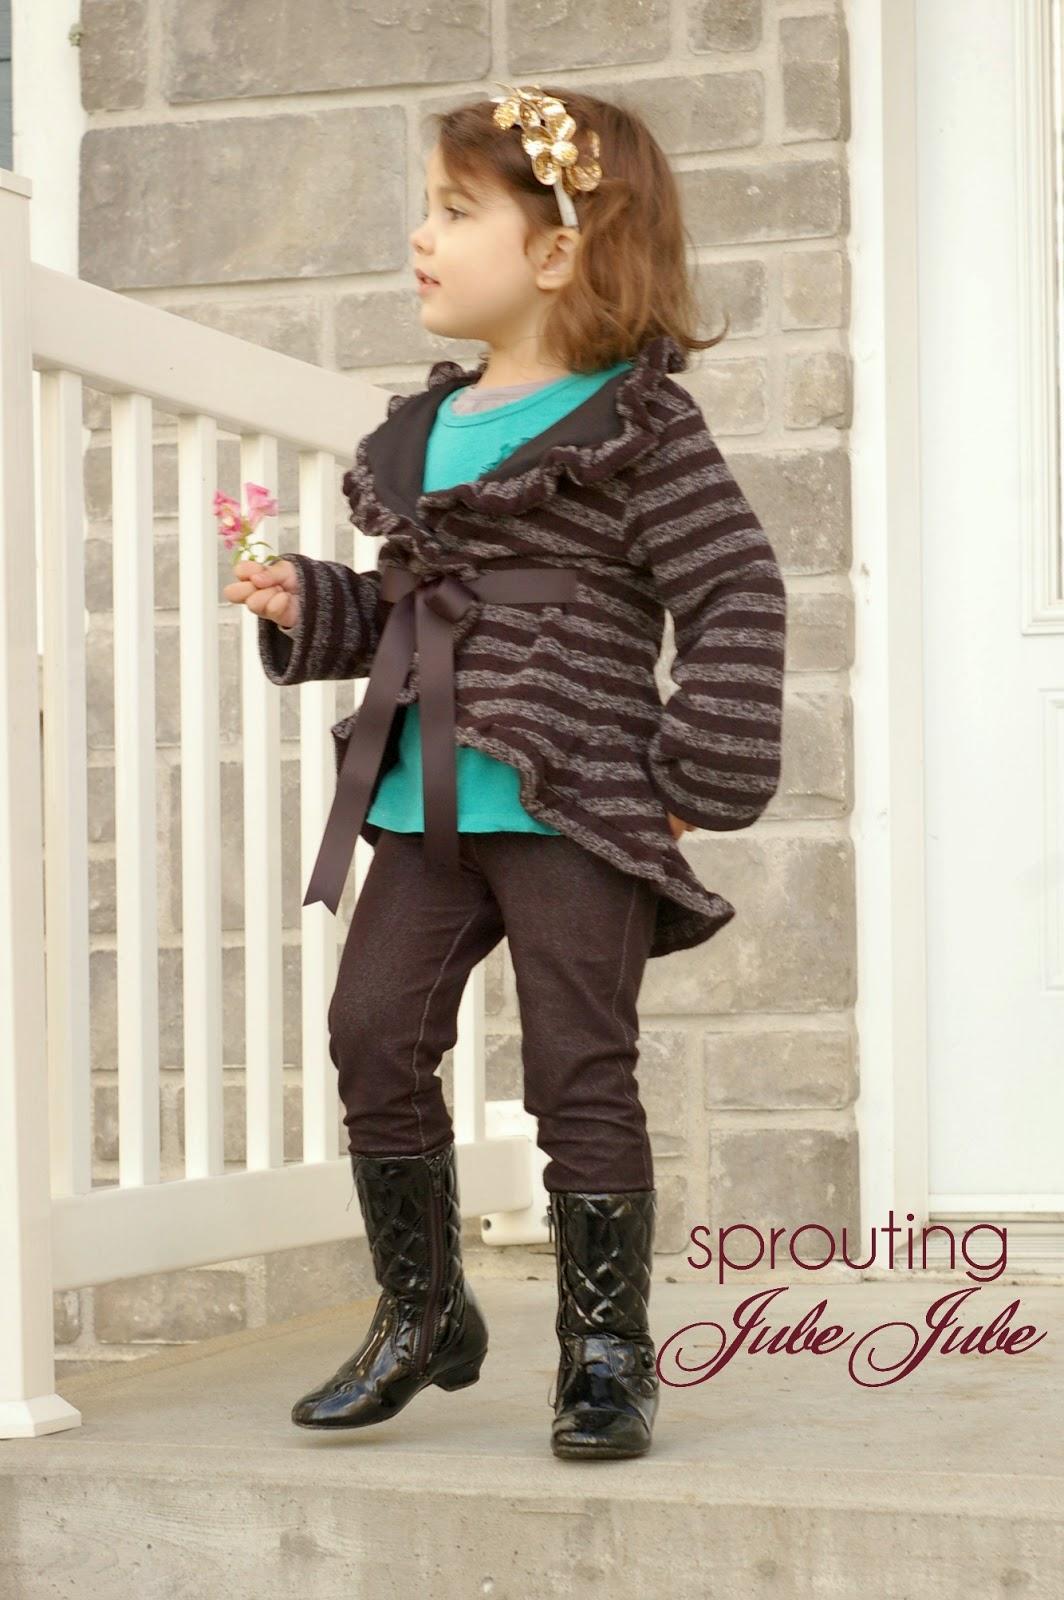 http://sproutingjj.blogspot.ca/